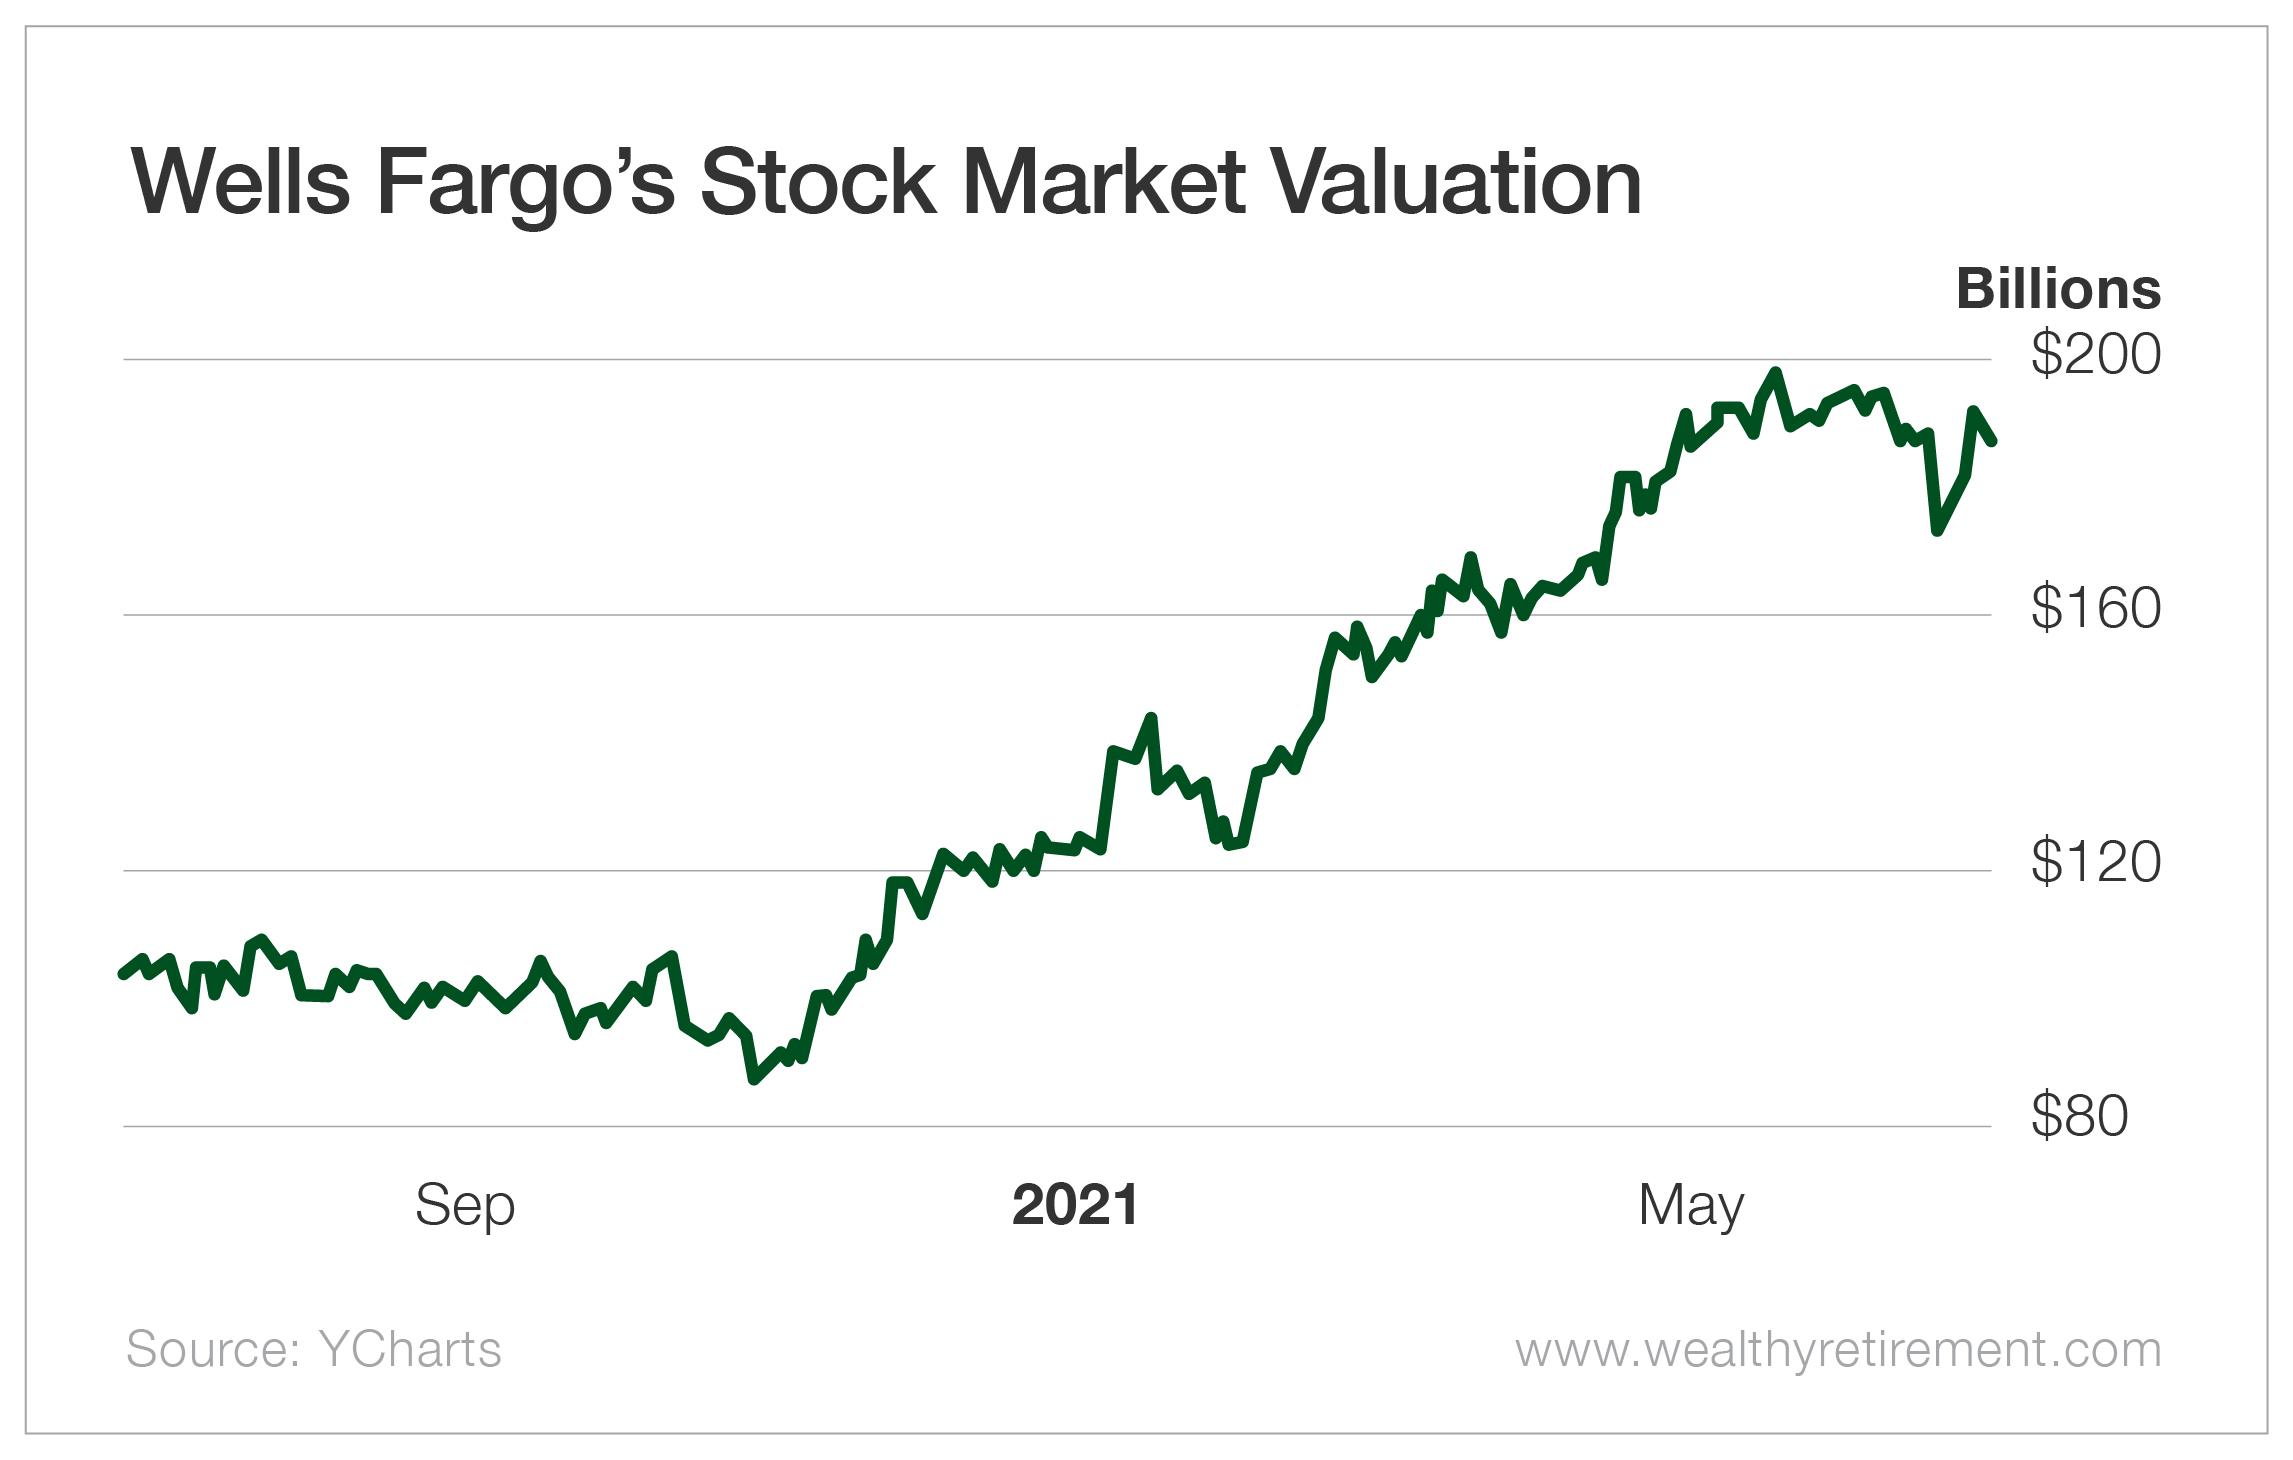 Wells Fargo's Stock Market Valuation